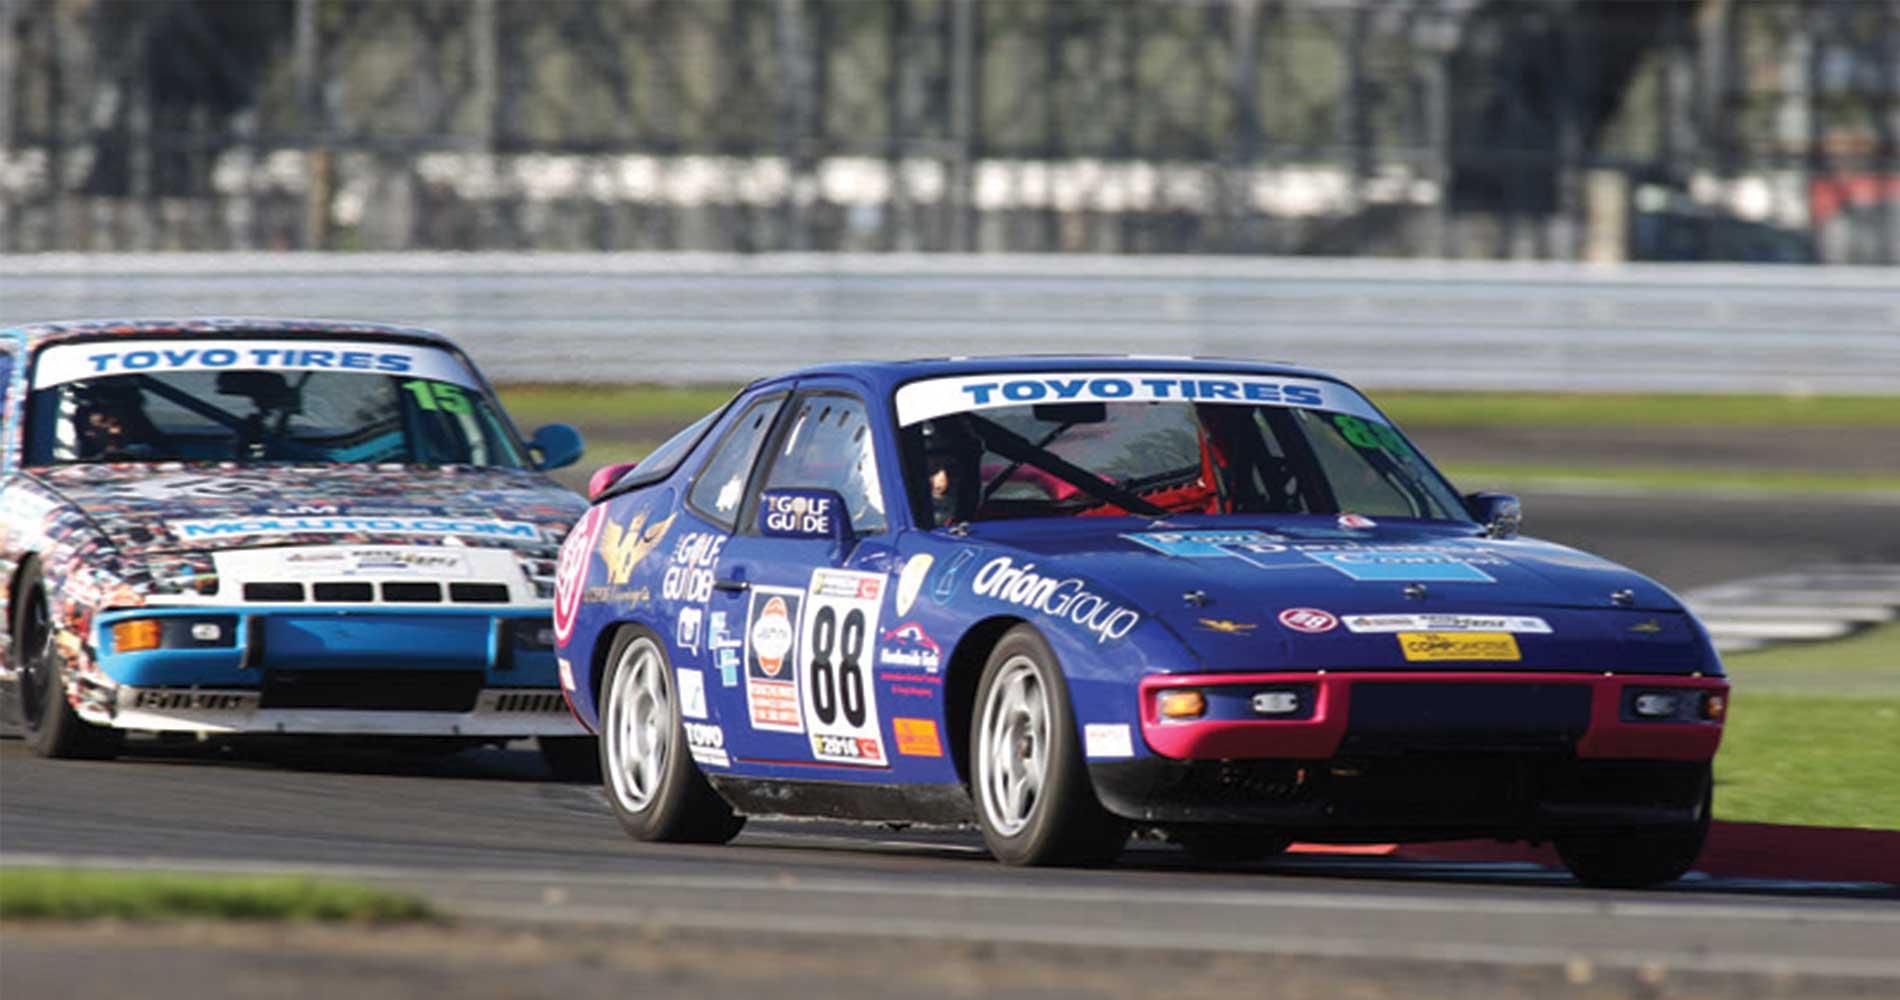 toyo-brscc-porsche-championship-race-report-motorsportdays-test-days-4